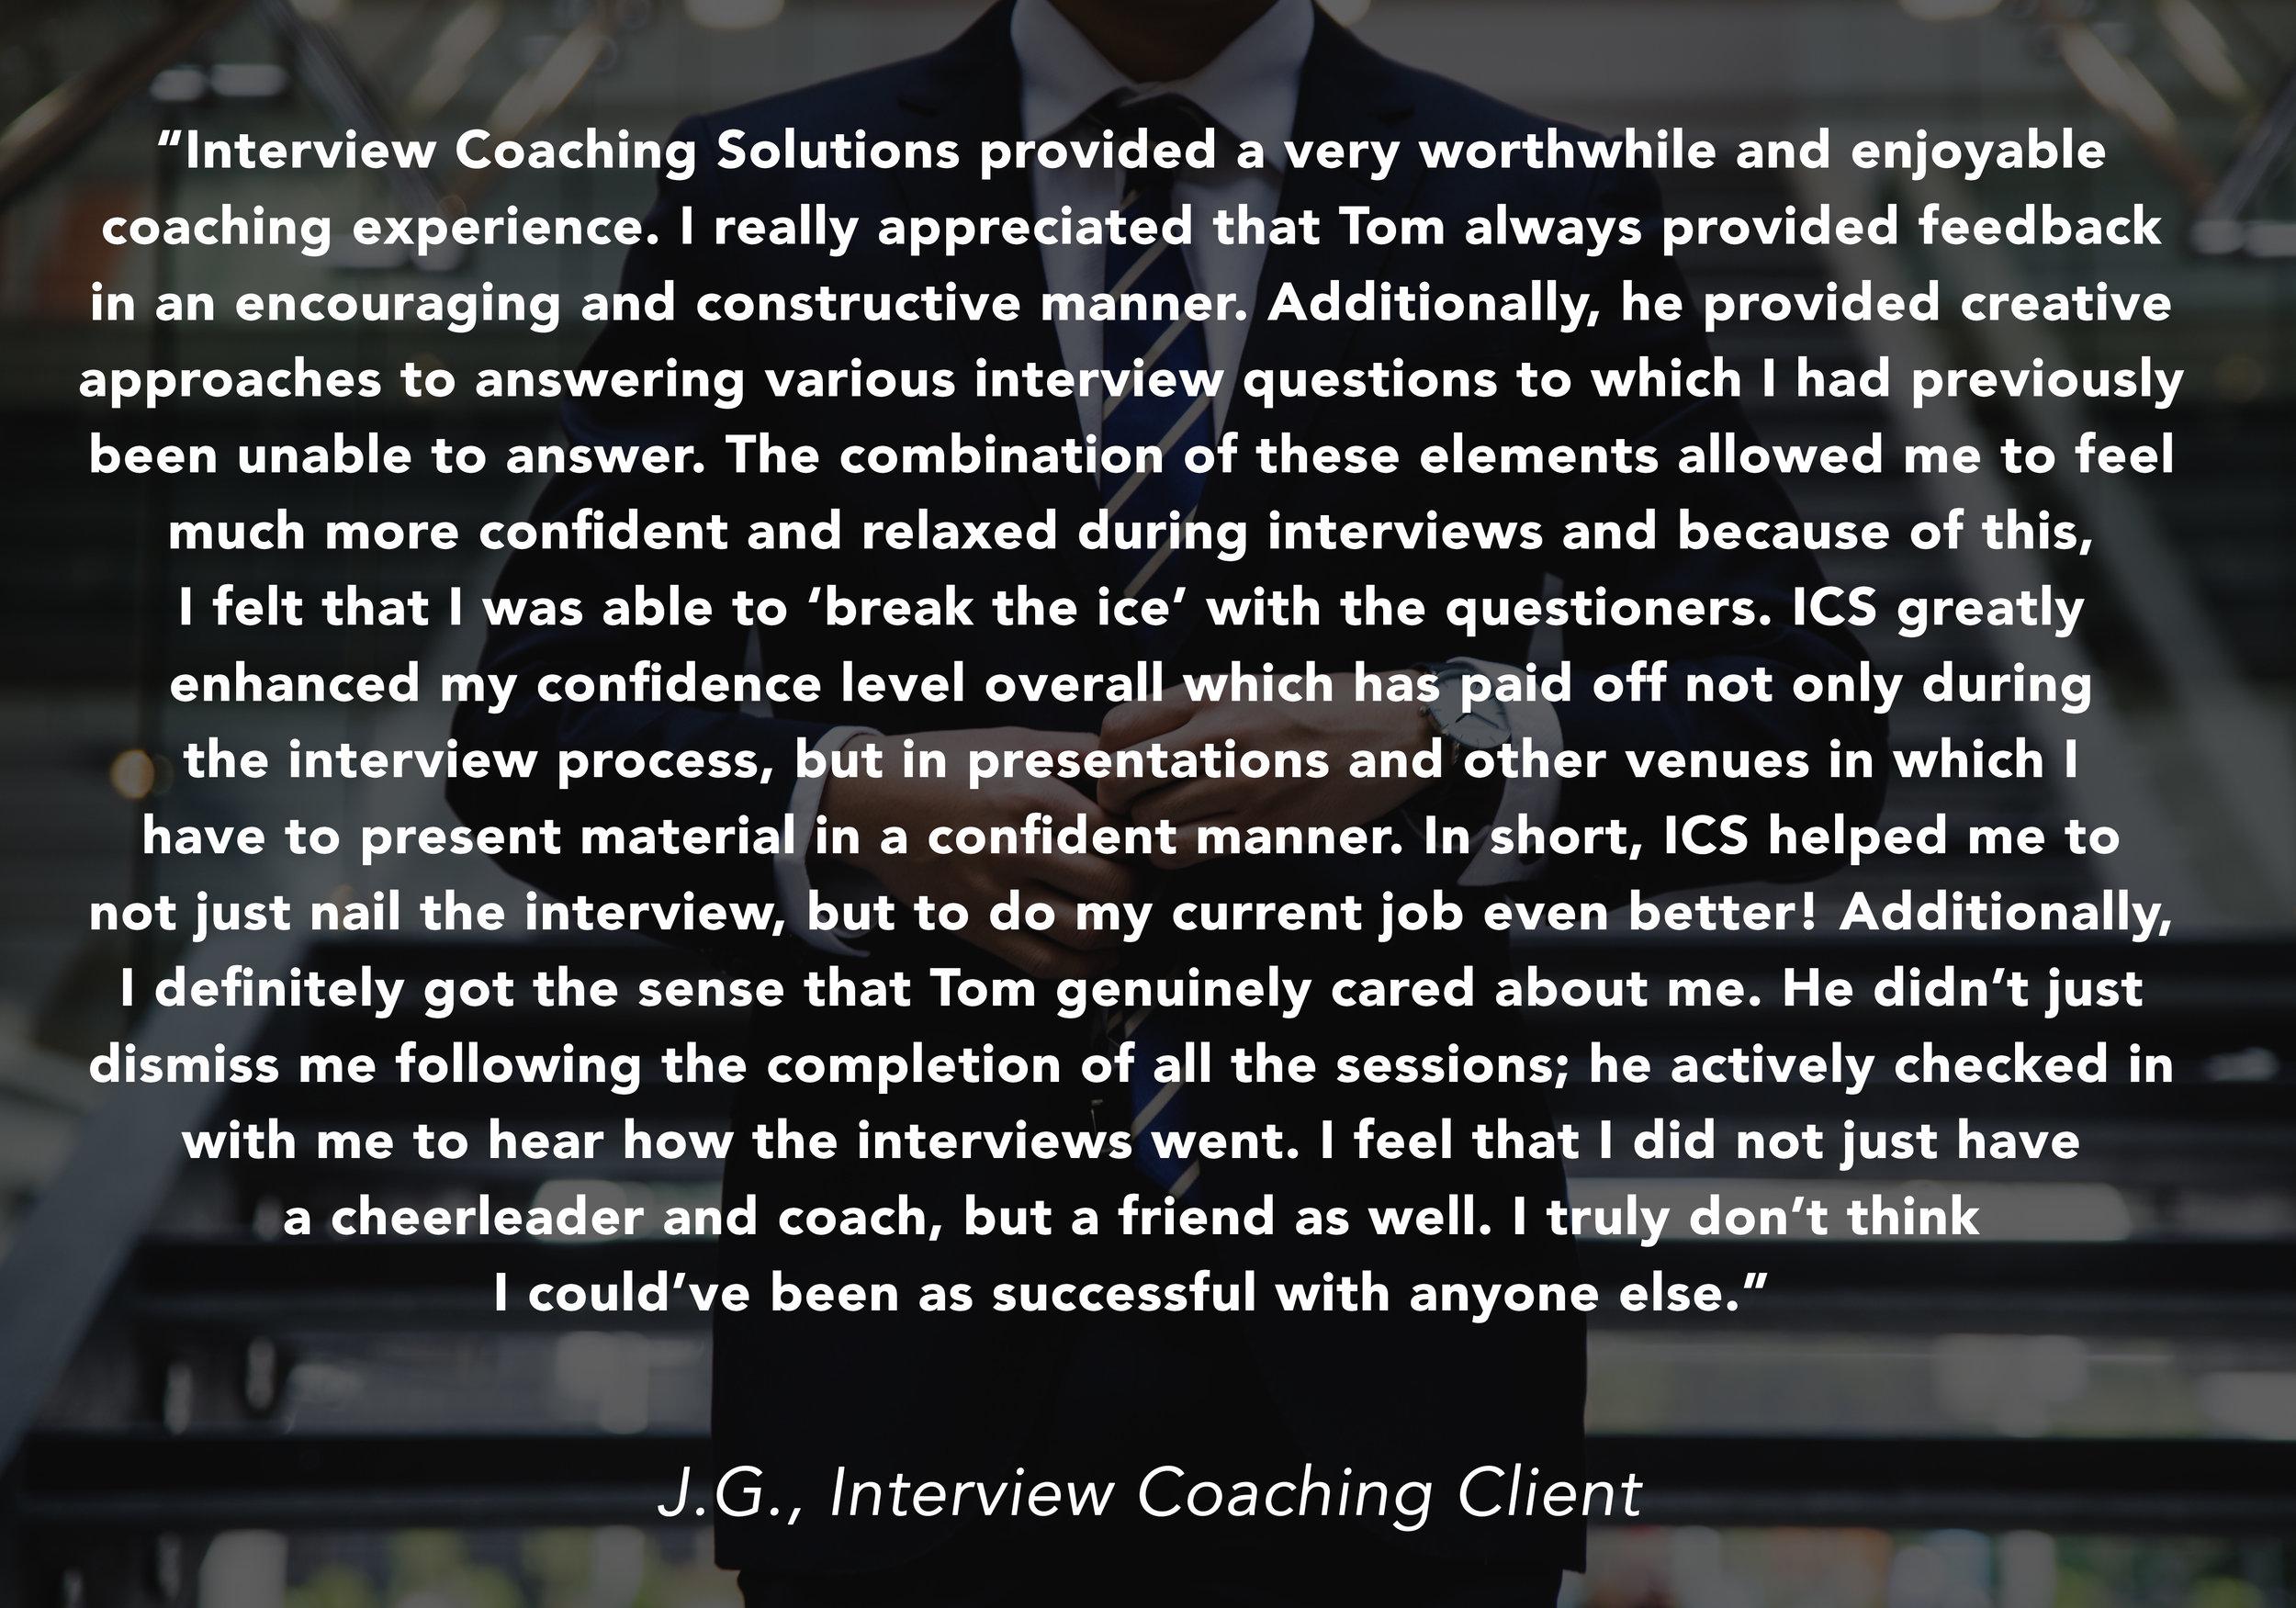 JG Testimonial.jpg